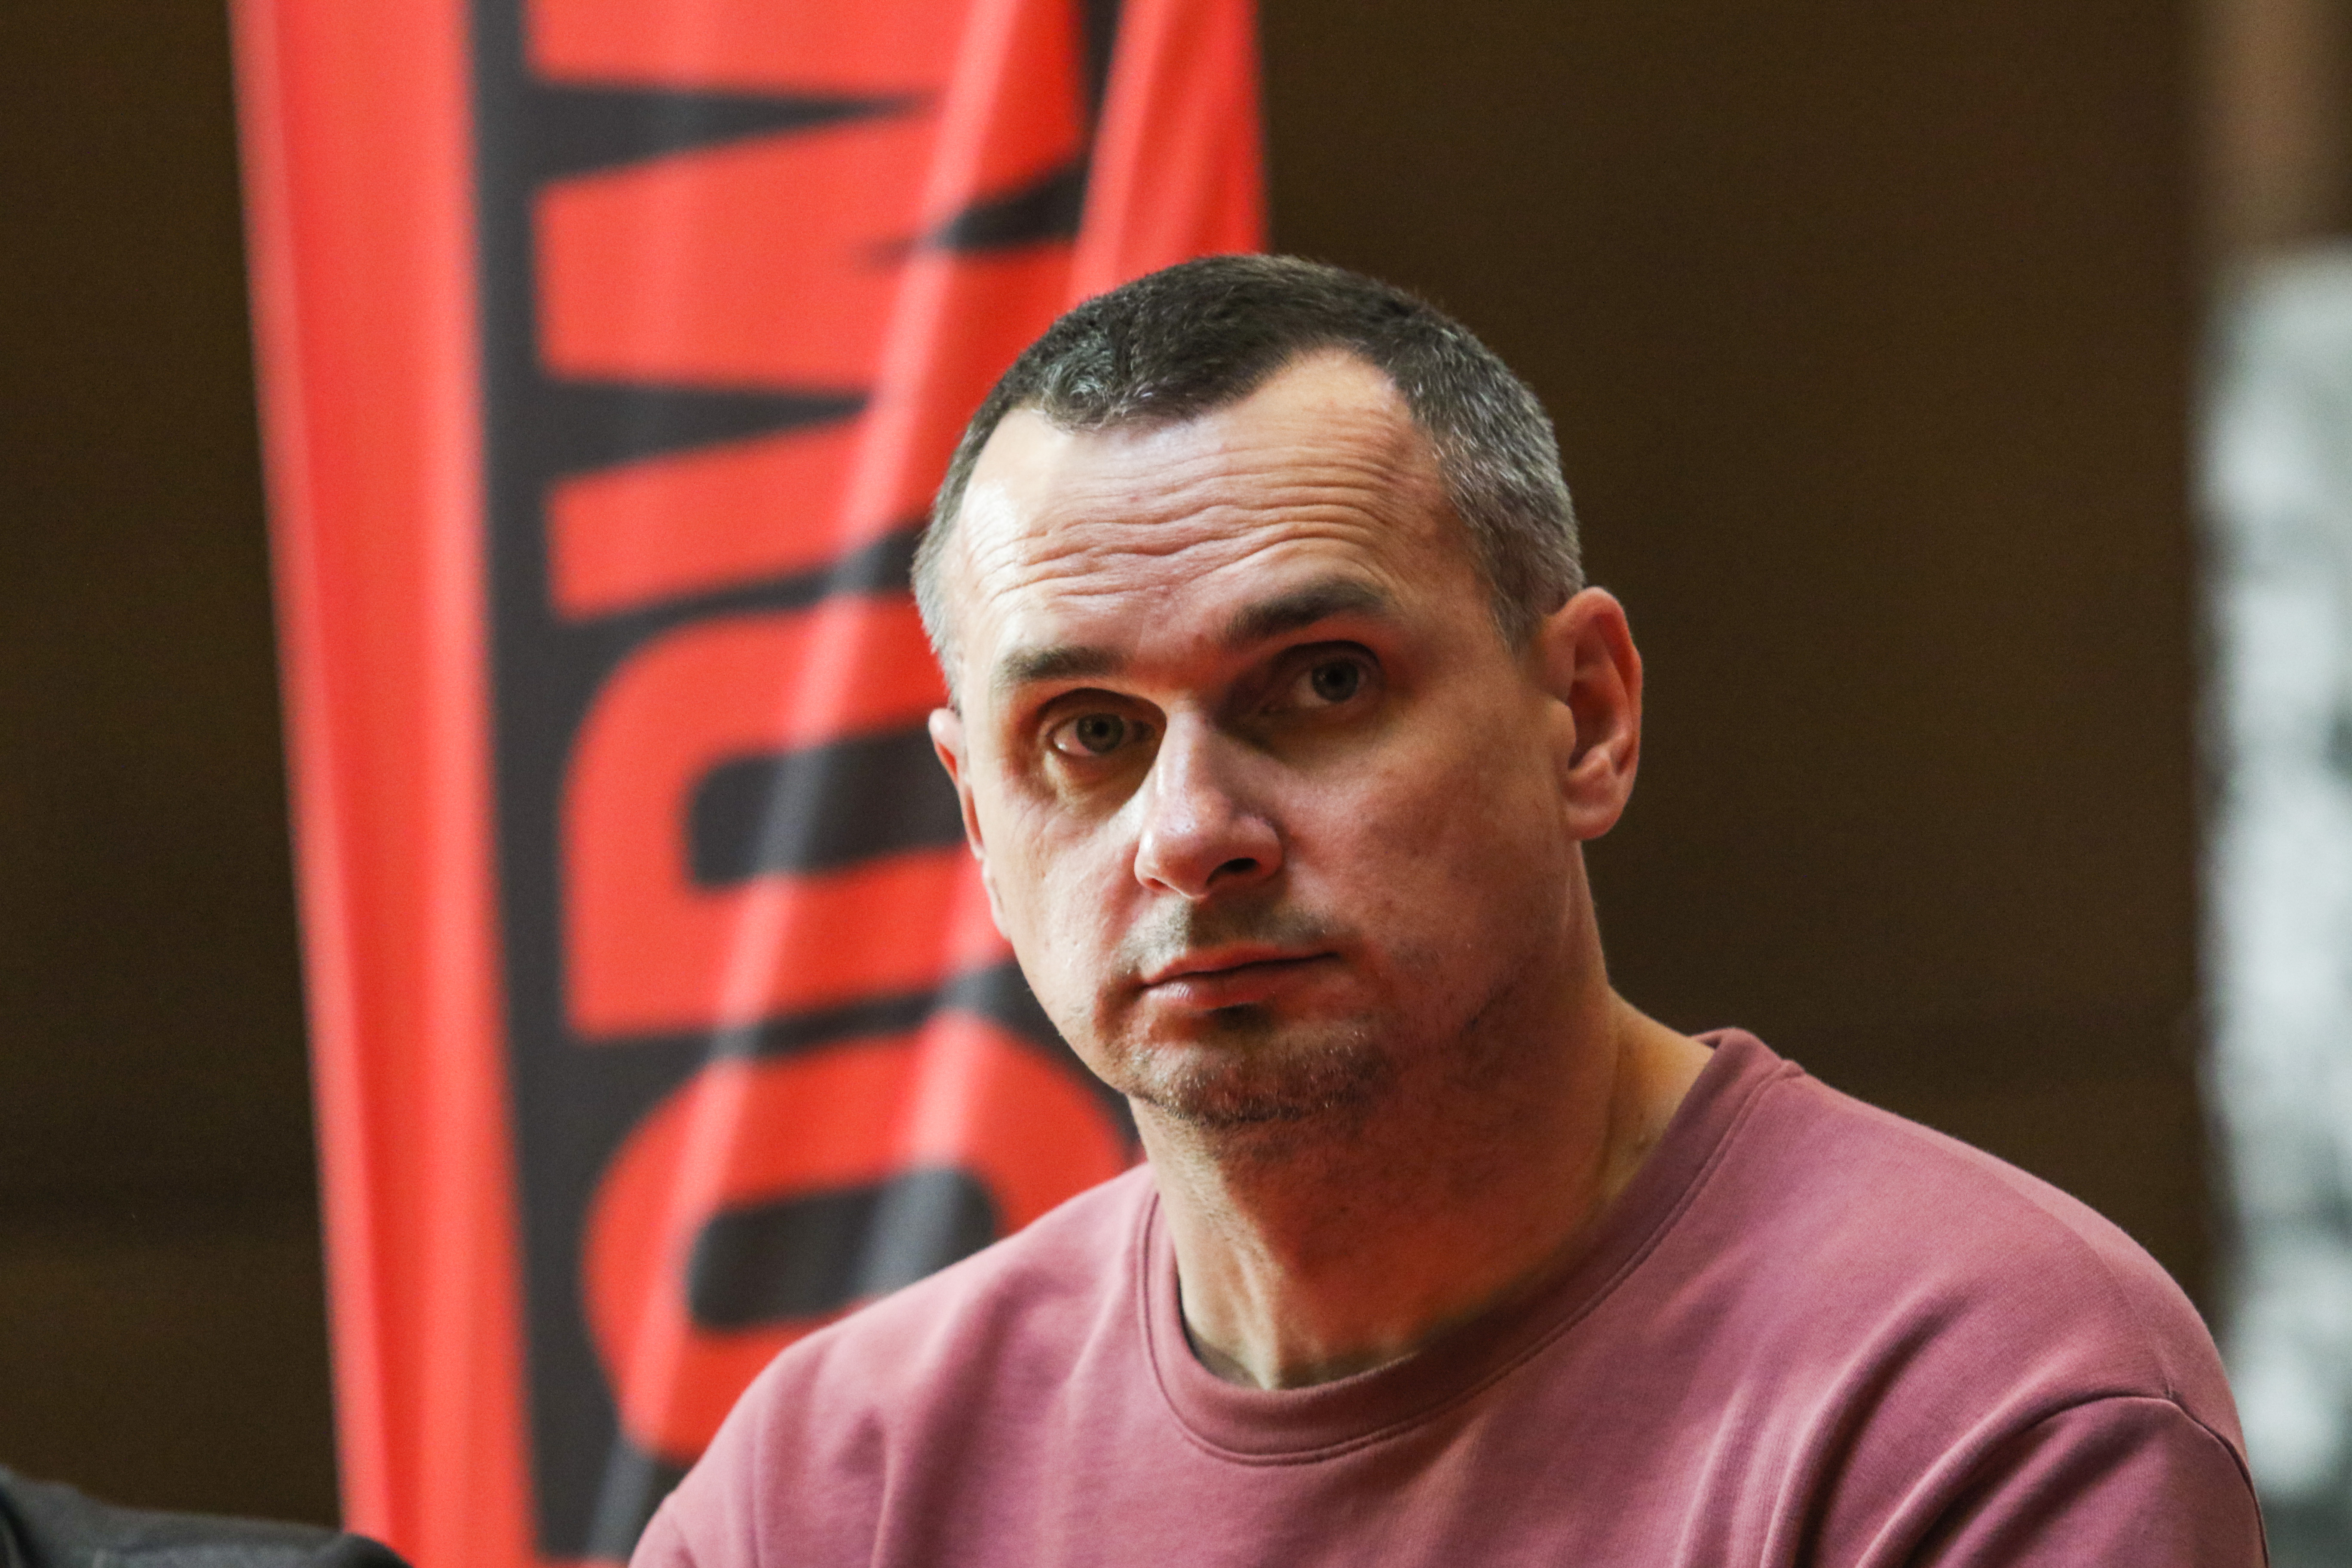 PEN America Celebrates Release of Political Prisoner